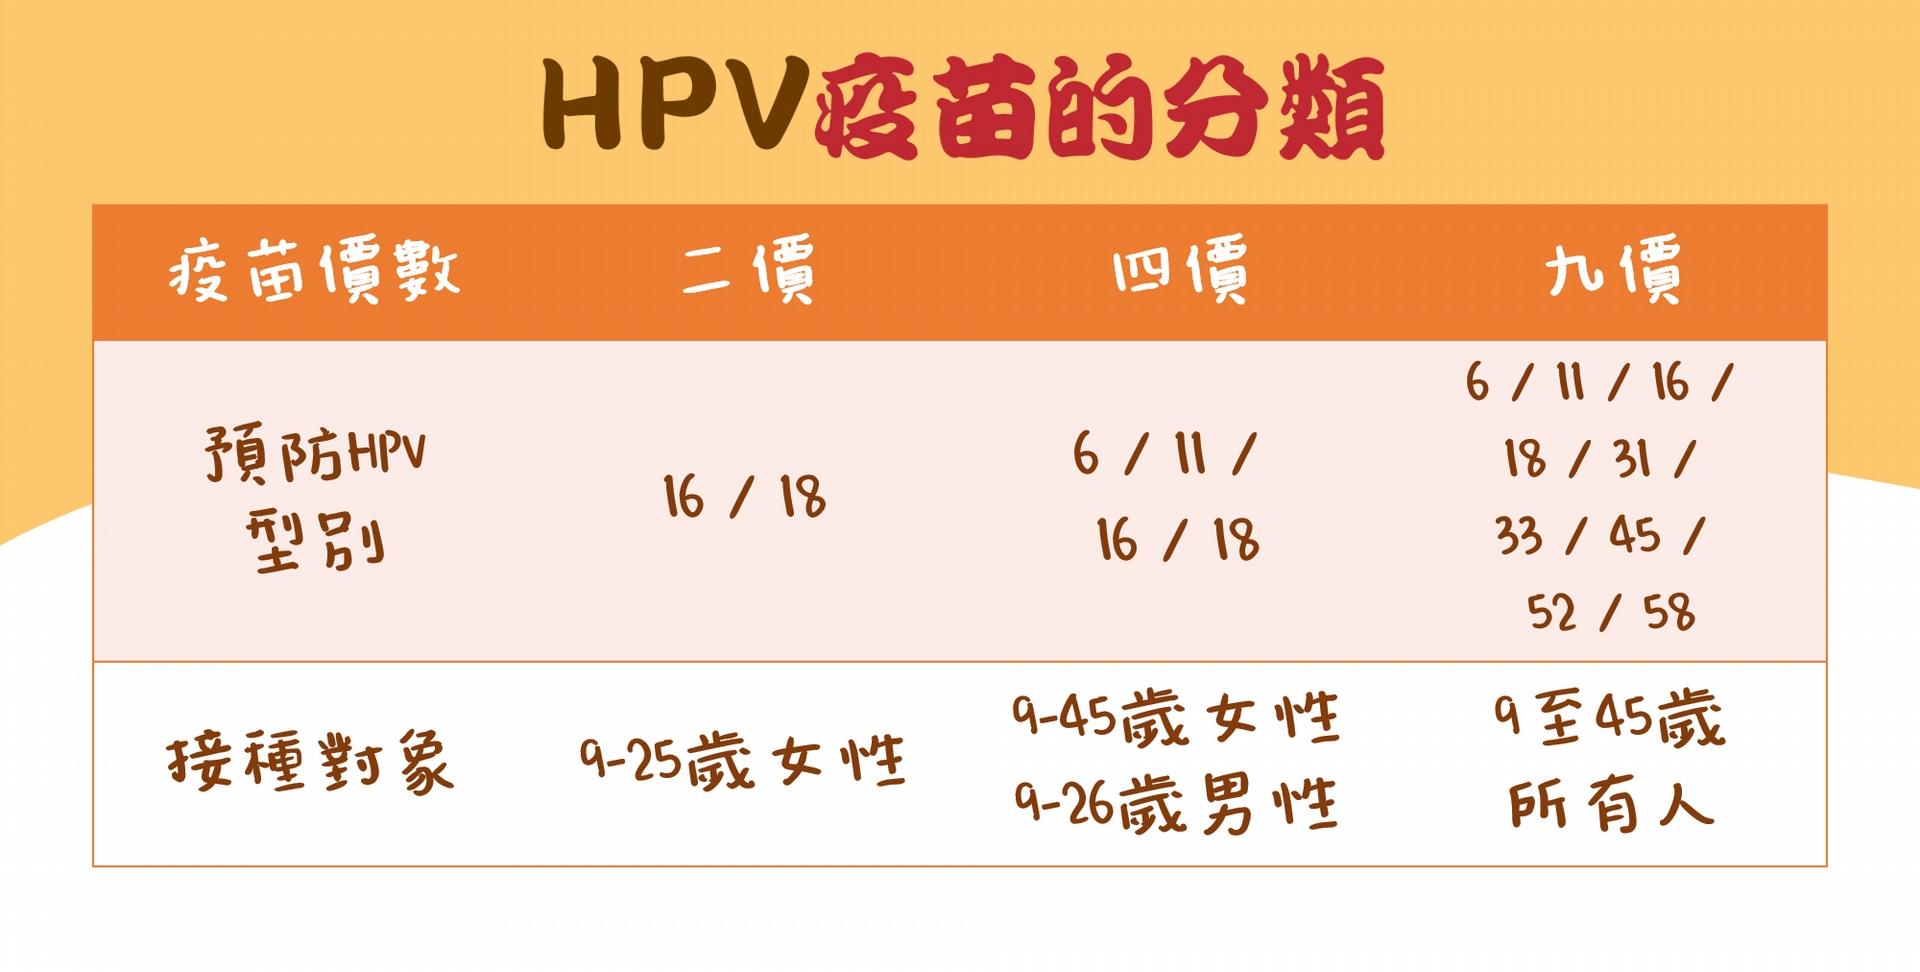 HPV疫苗的分類及接種對象。資料來源:衛福部HPV疫苗仿單